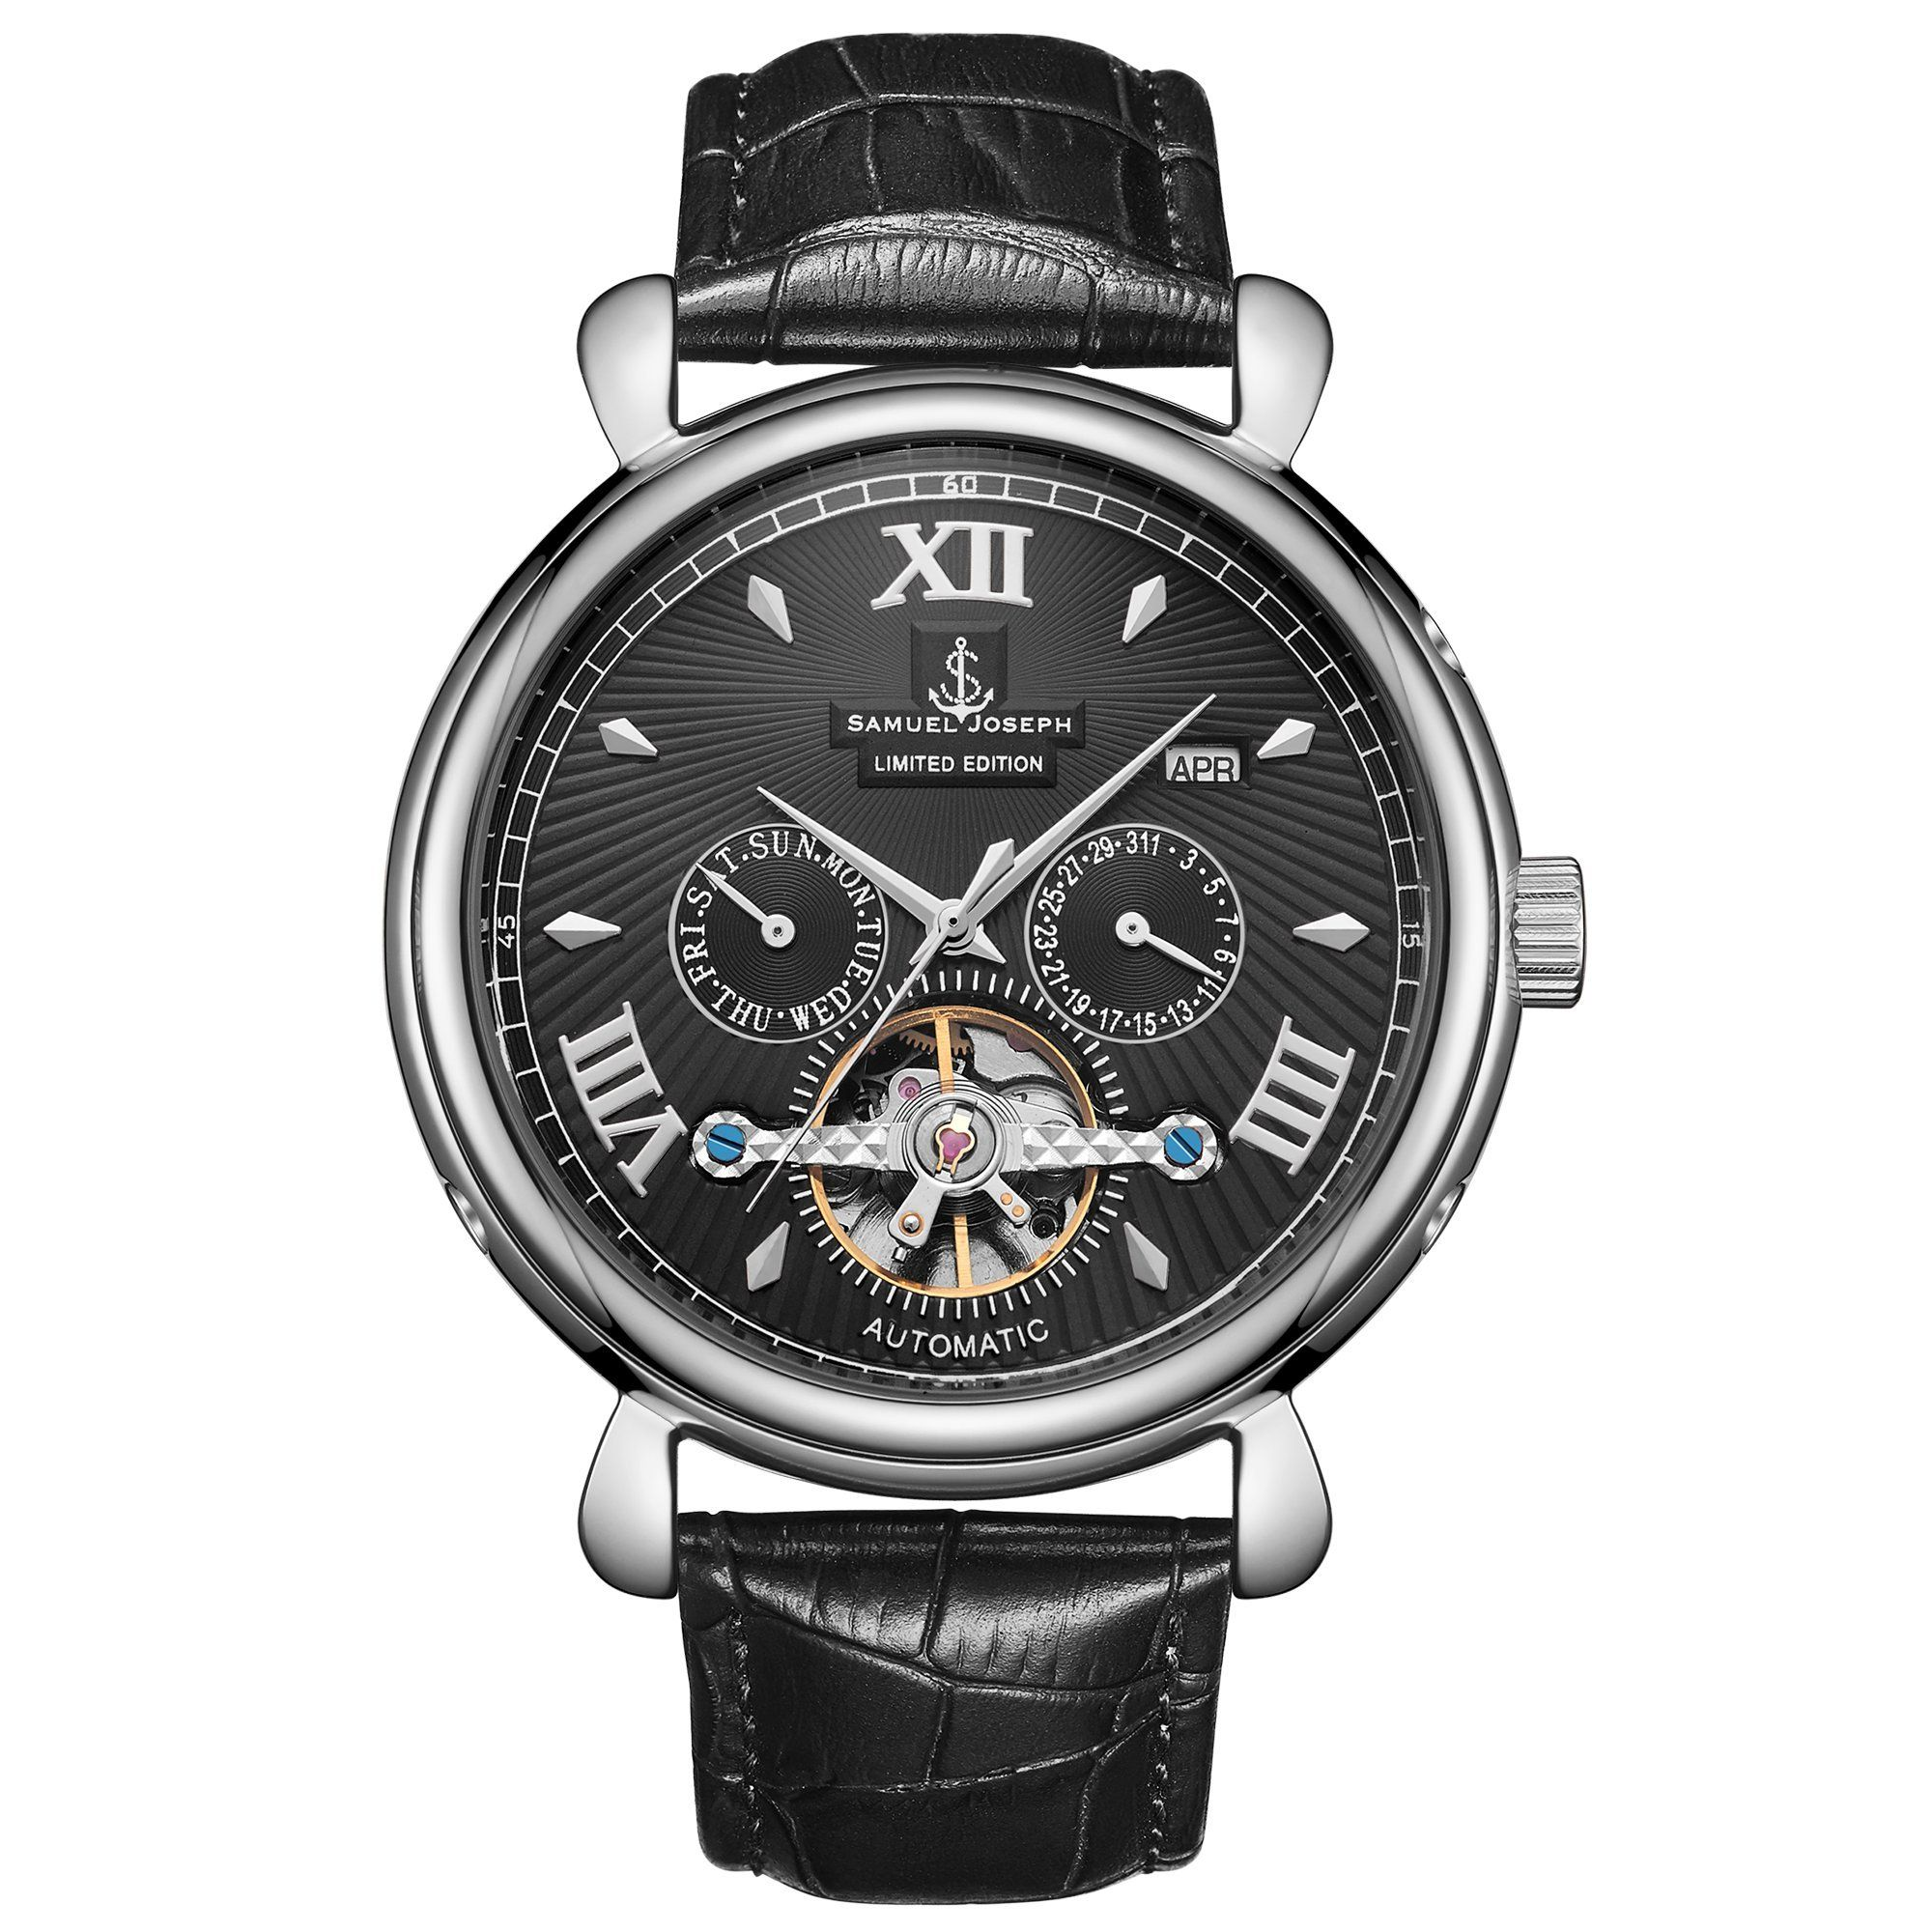 Samuel Joseph Limited Edition Steel & Black Automatic Designer Mens Watch